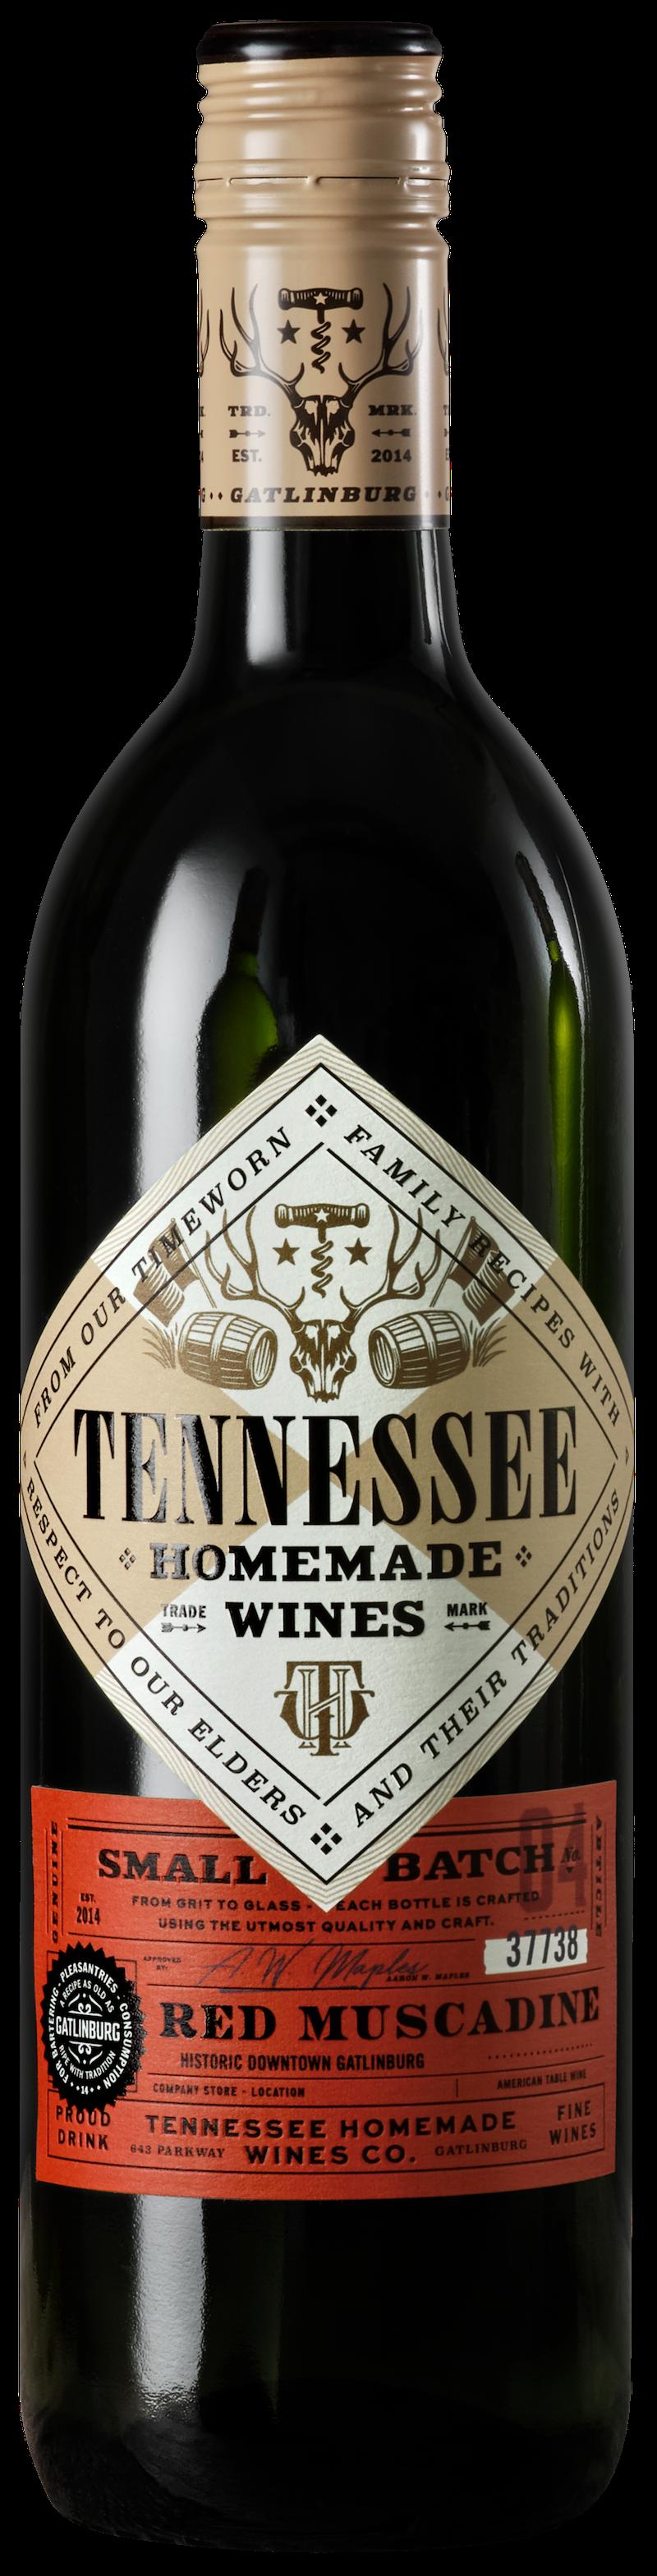 Tennessee Homemade Wines red muscadine wine